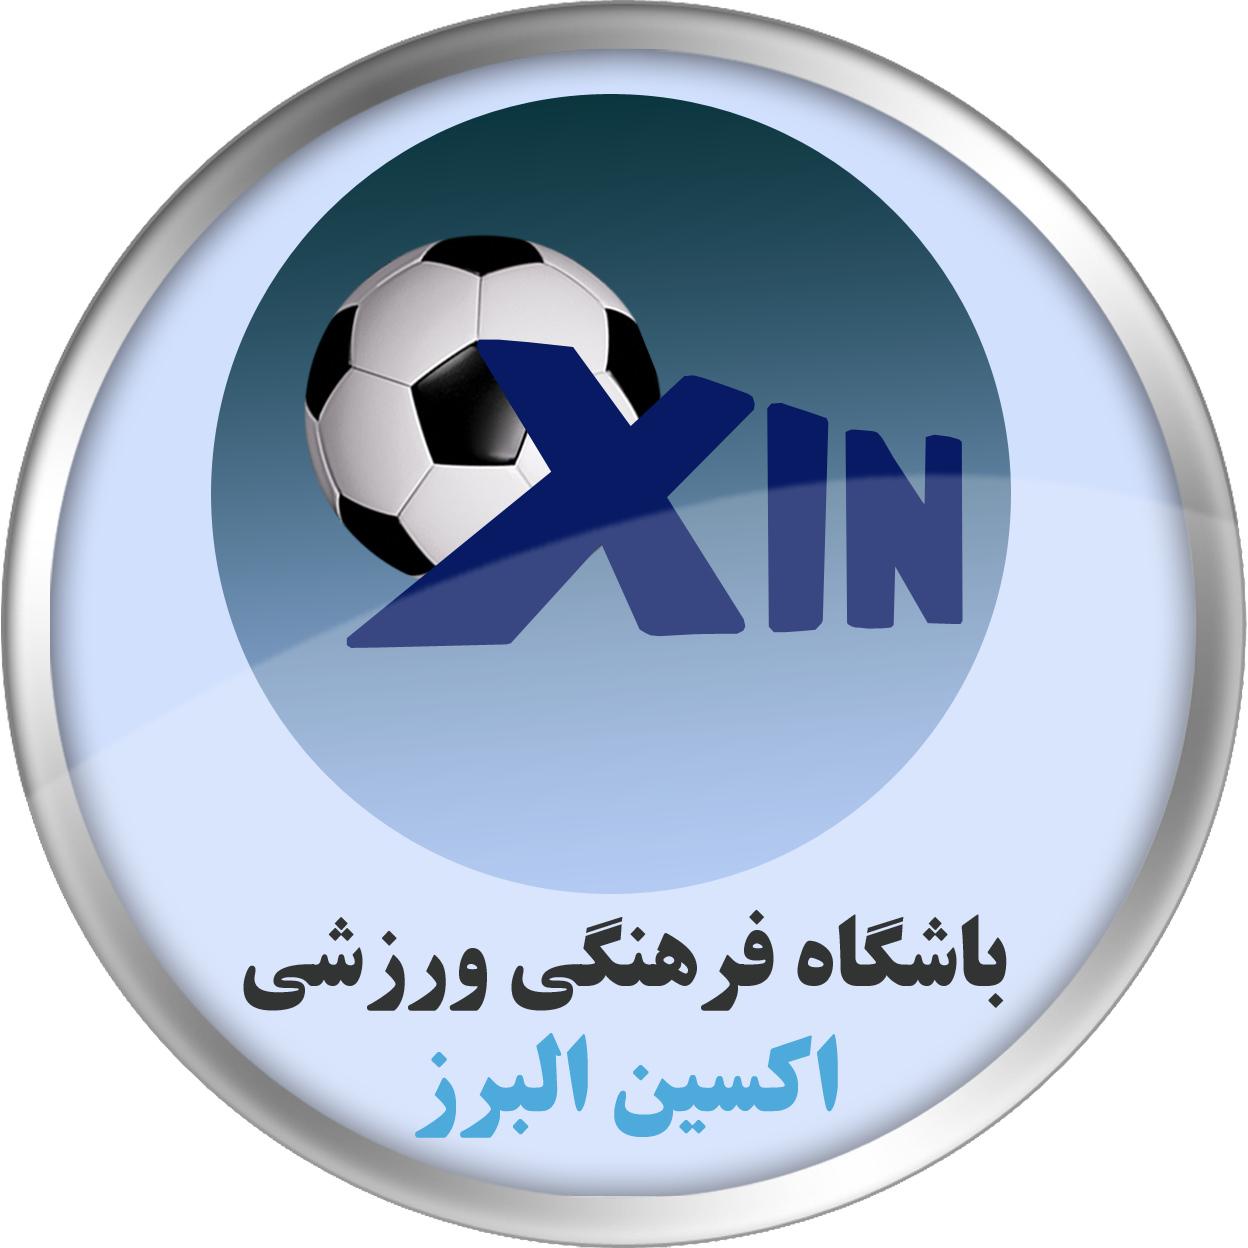 Gol Reyhan Alborz team logo